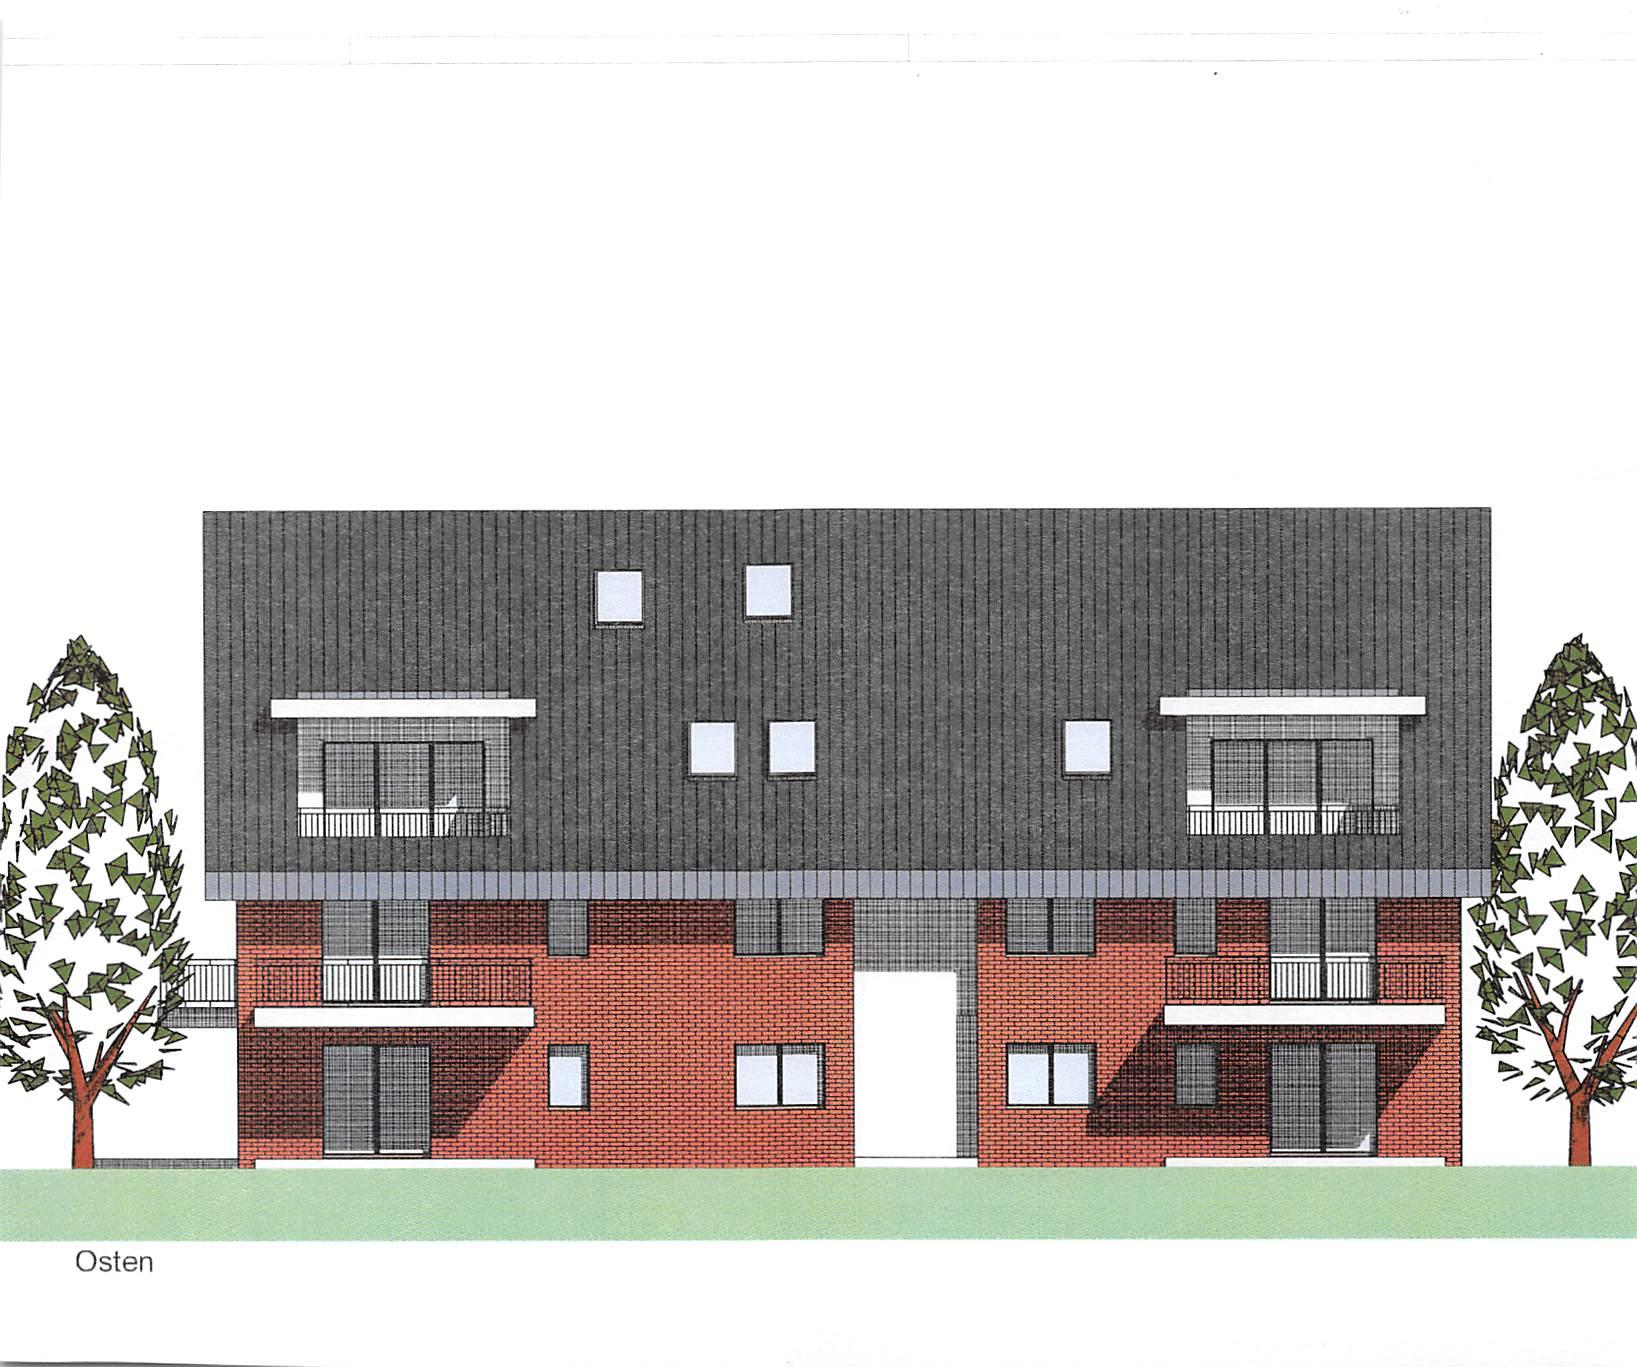 neubau erdgeschoss whg kfw 55 barrierefrei 2 zkb. Black Bedroom Furniture Sets. Home Design Ideas